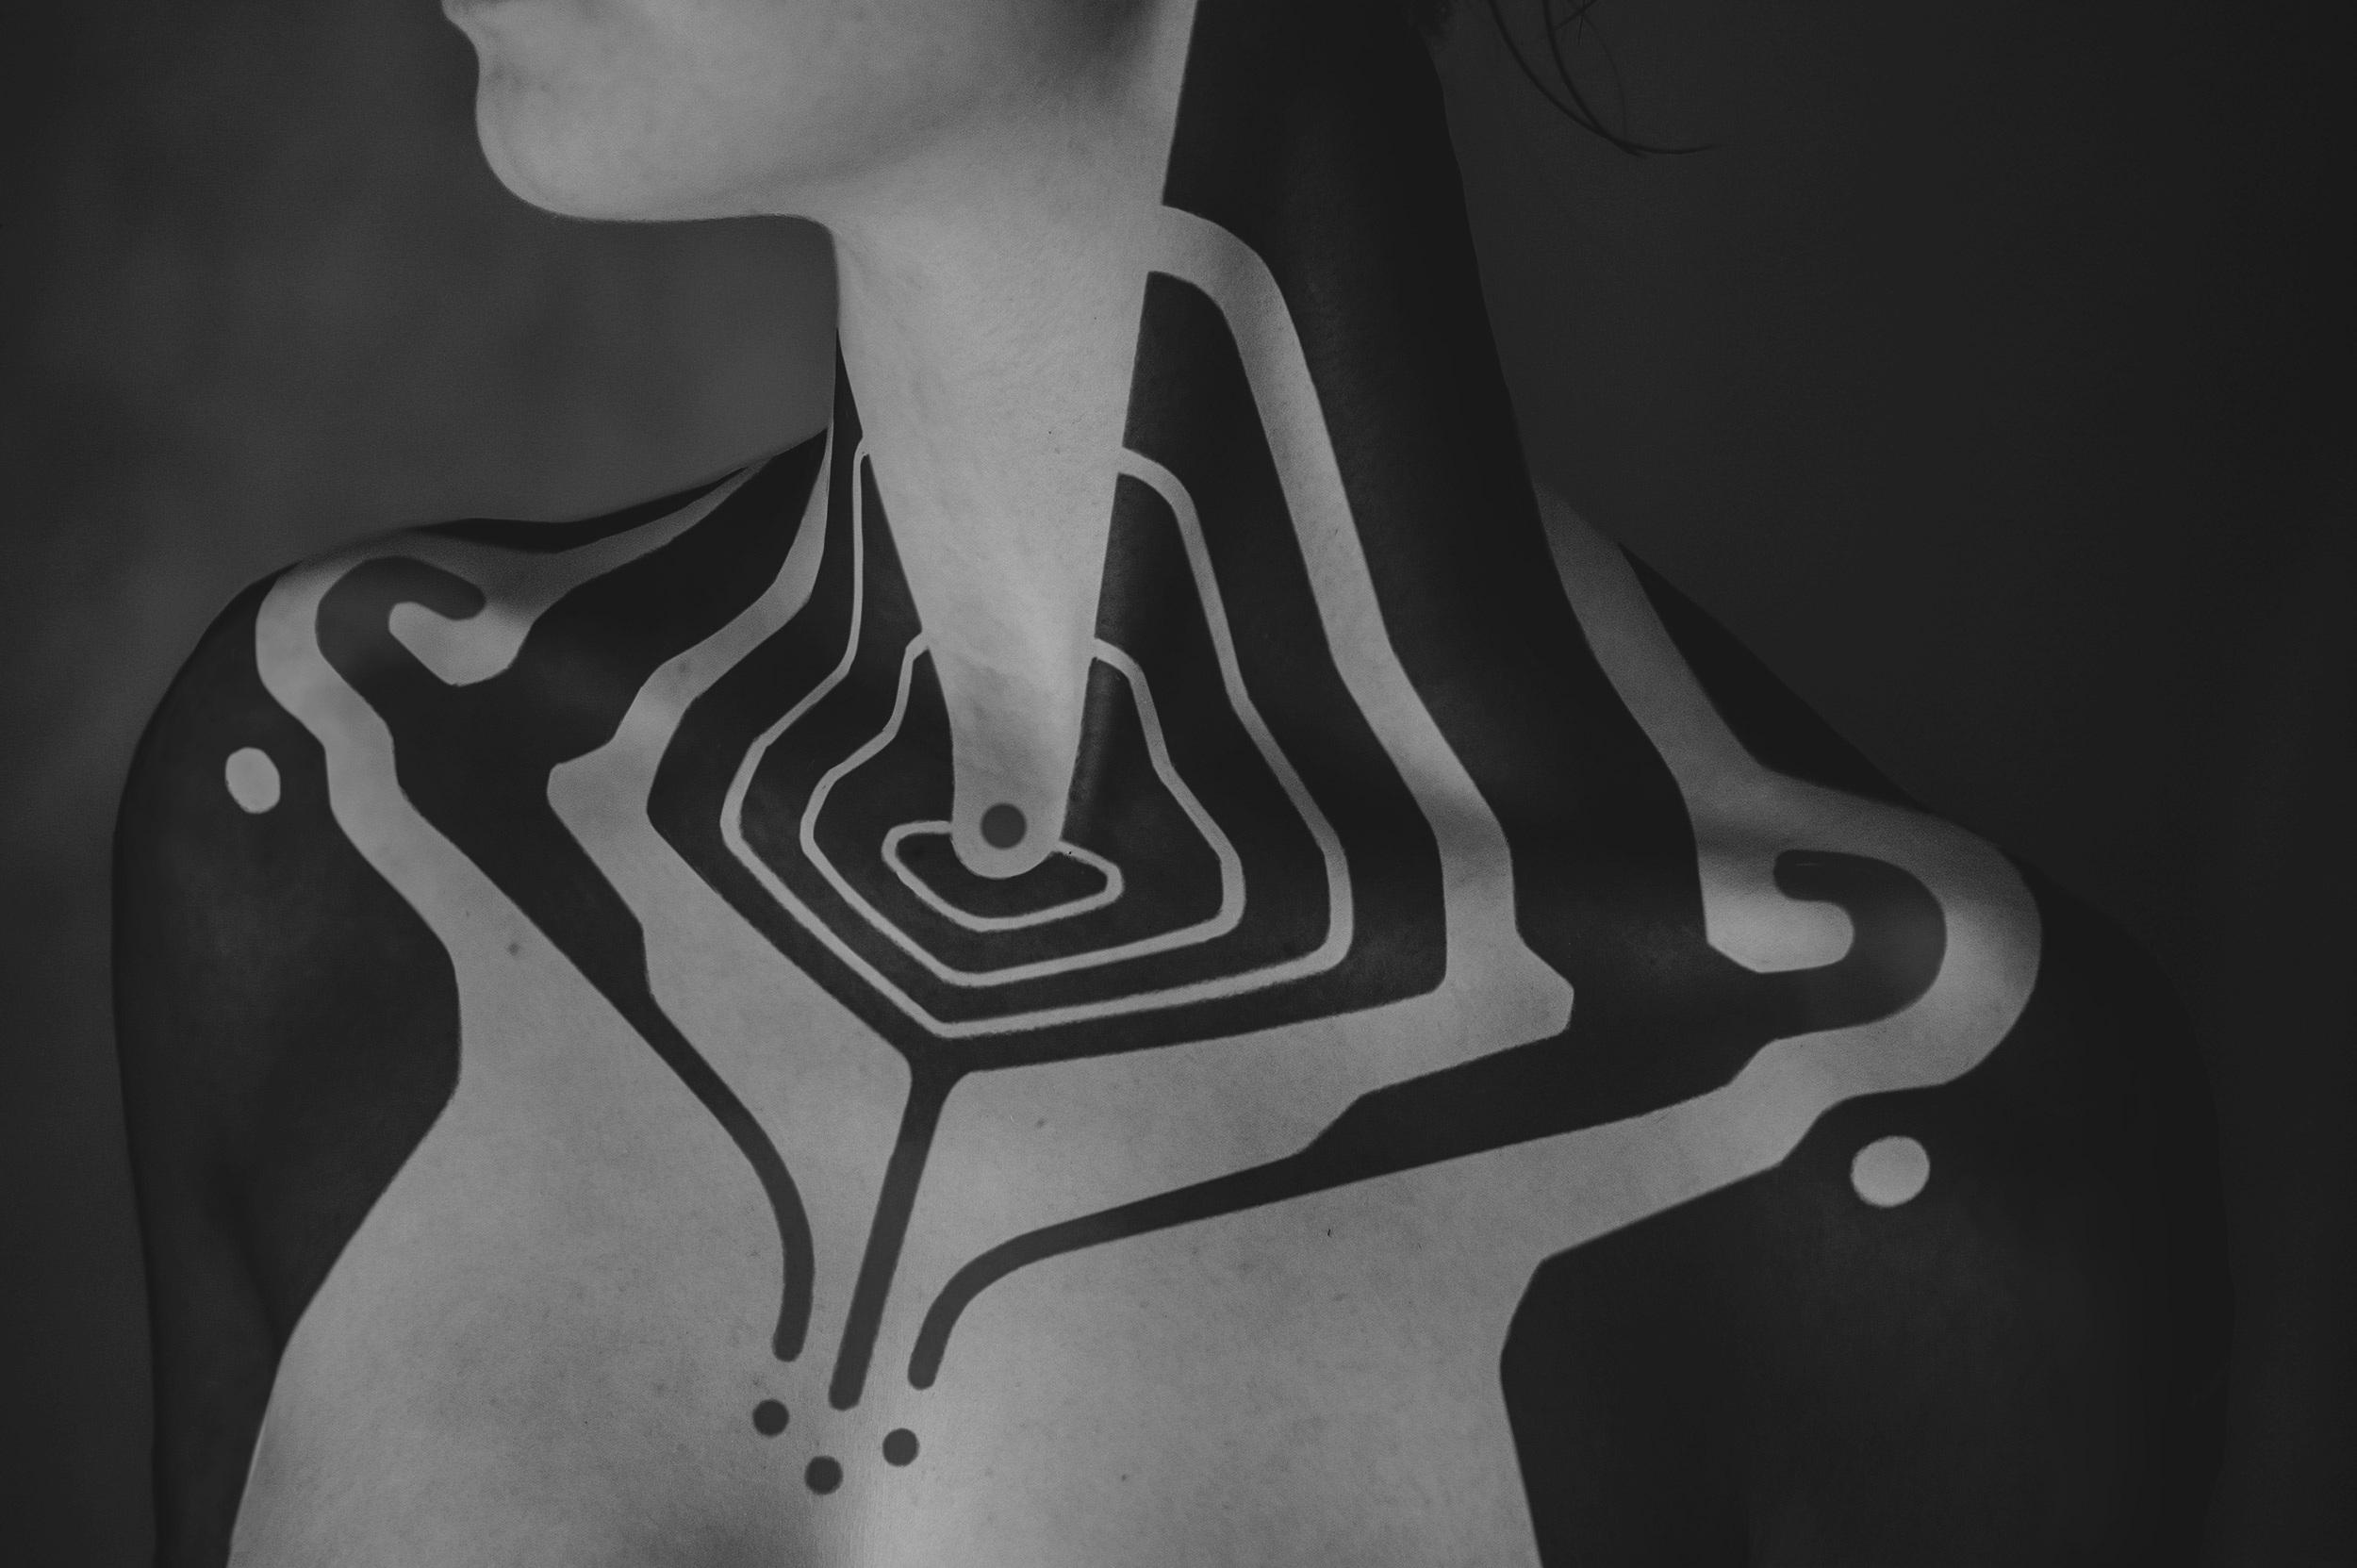 Designs - Digital Concepts